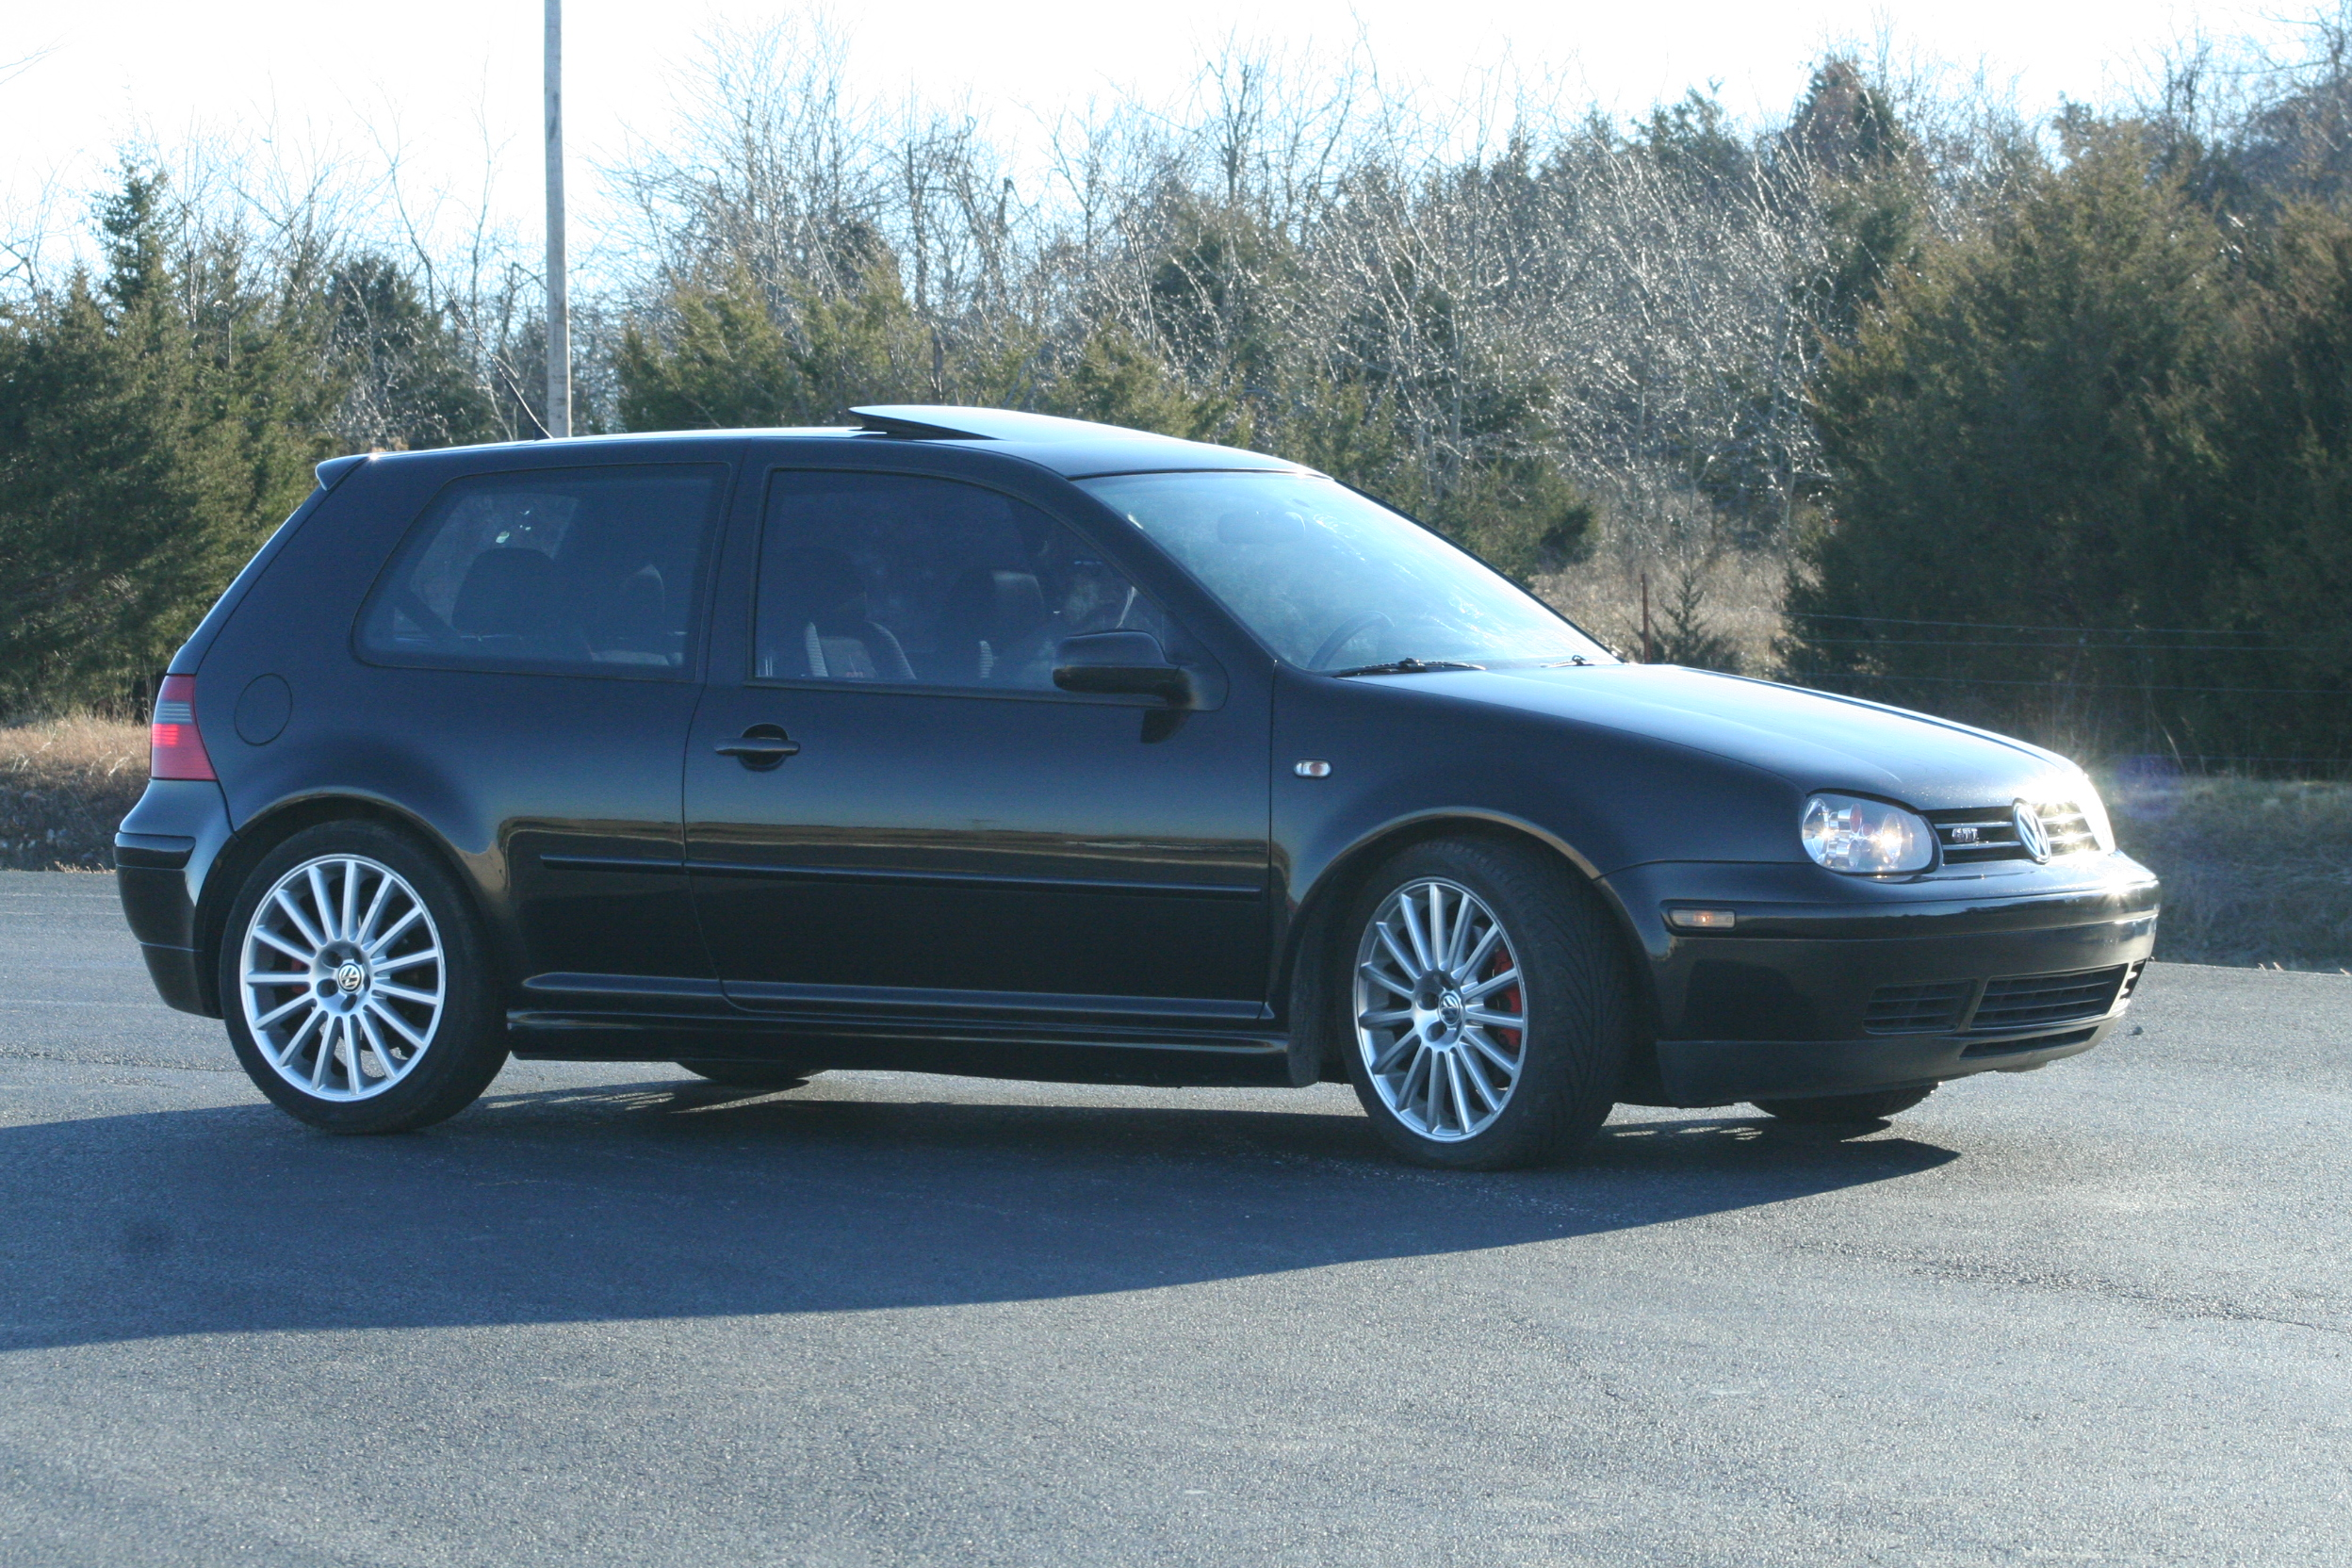 Vw Gti 0 60 >> 2003 VW GTI 20th Anniversary | Whisper